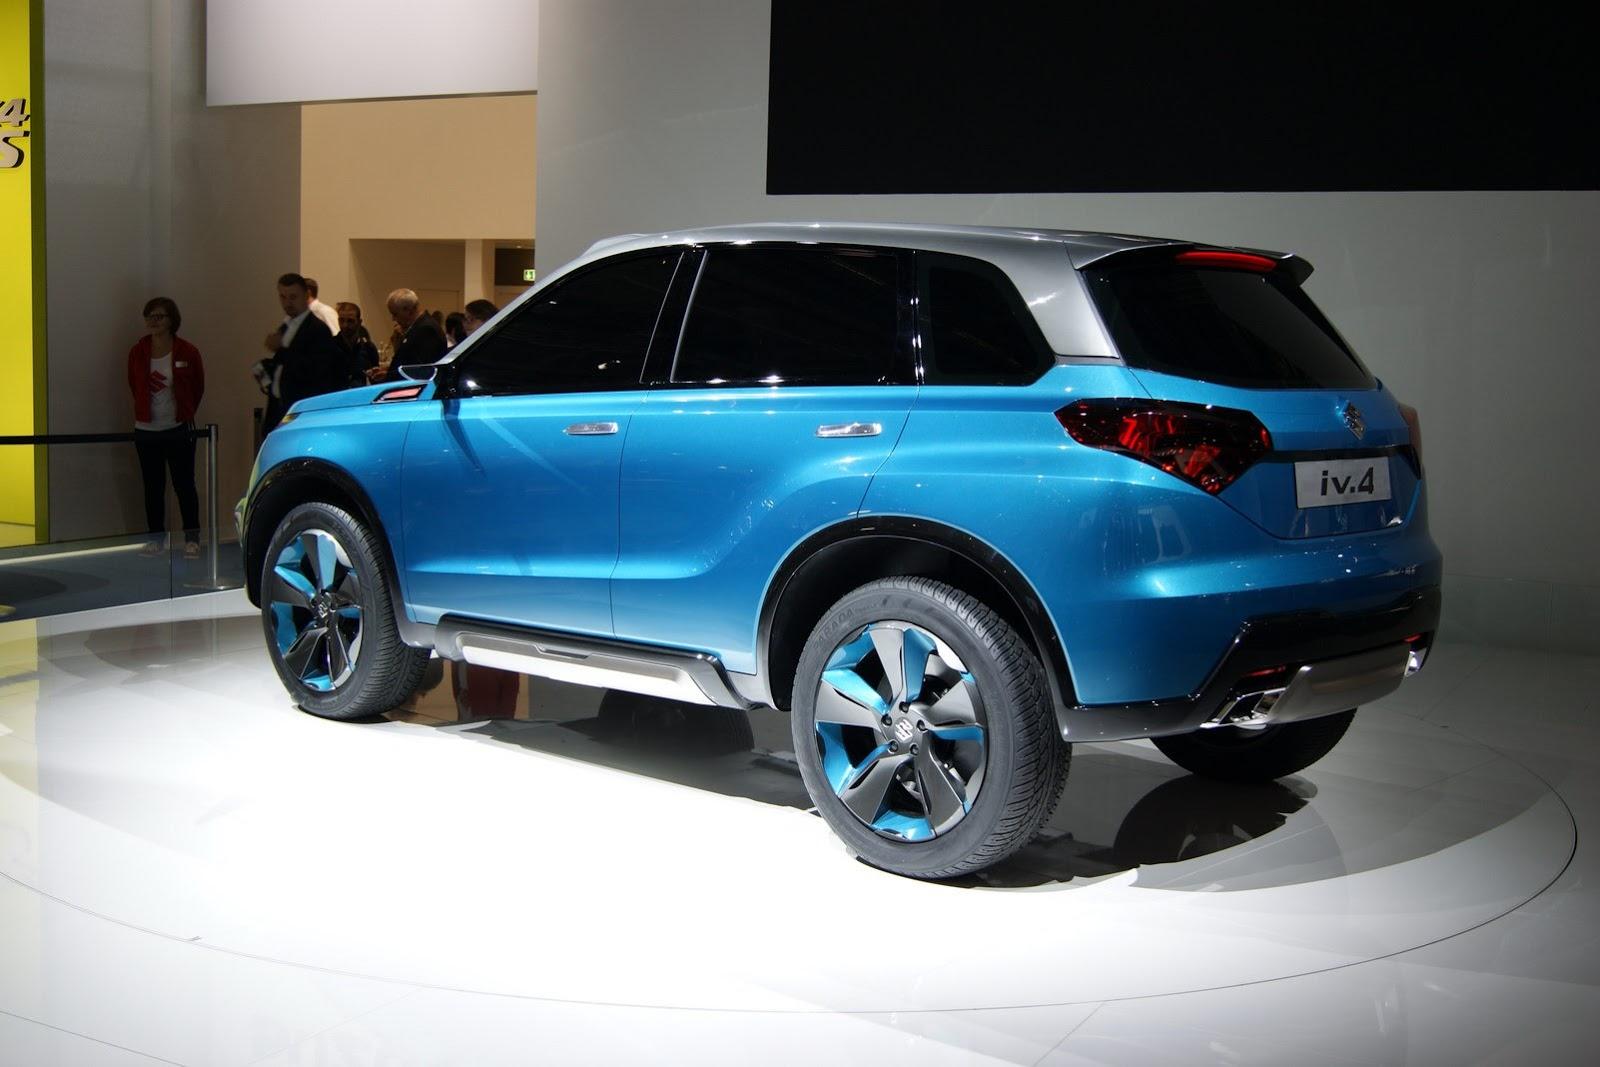 Suzuki-iv4-Compact-Suv (2)